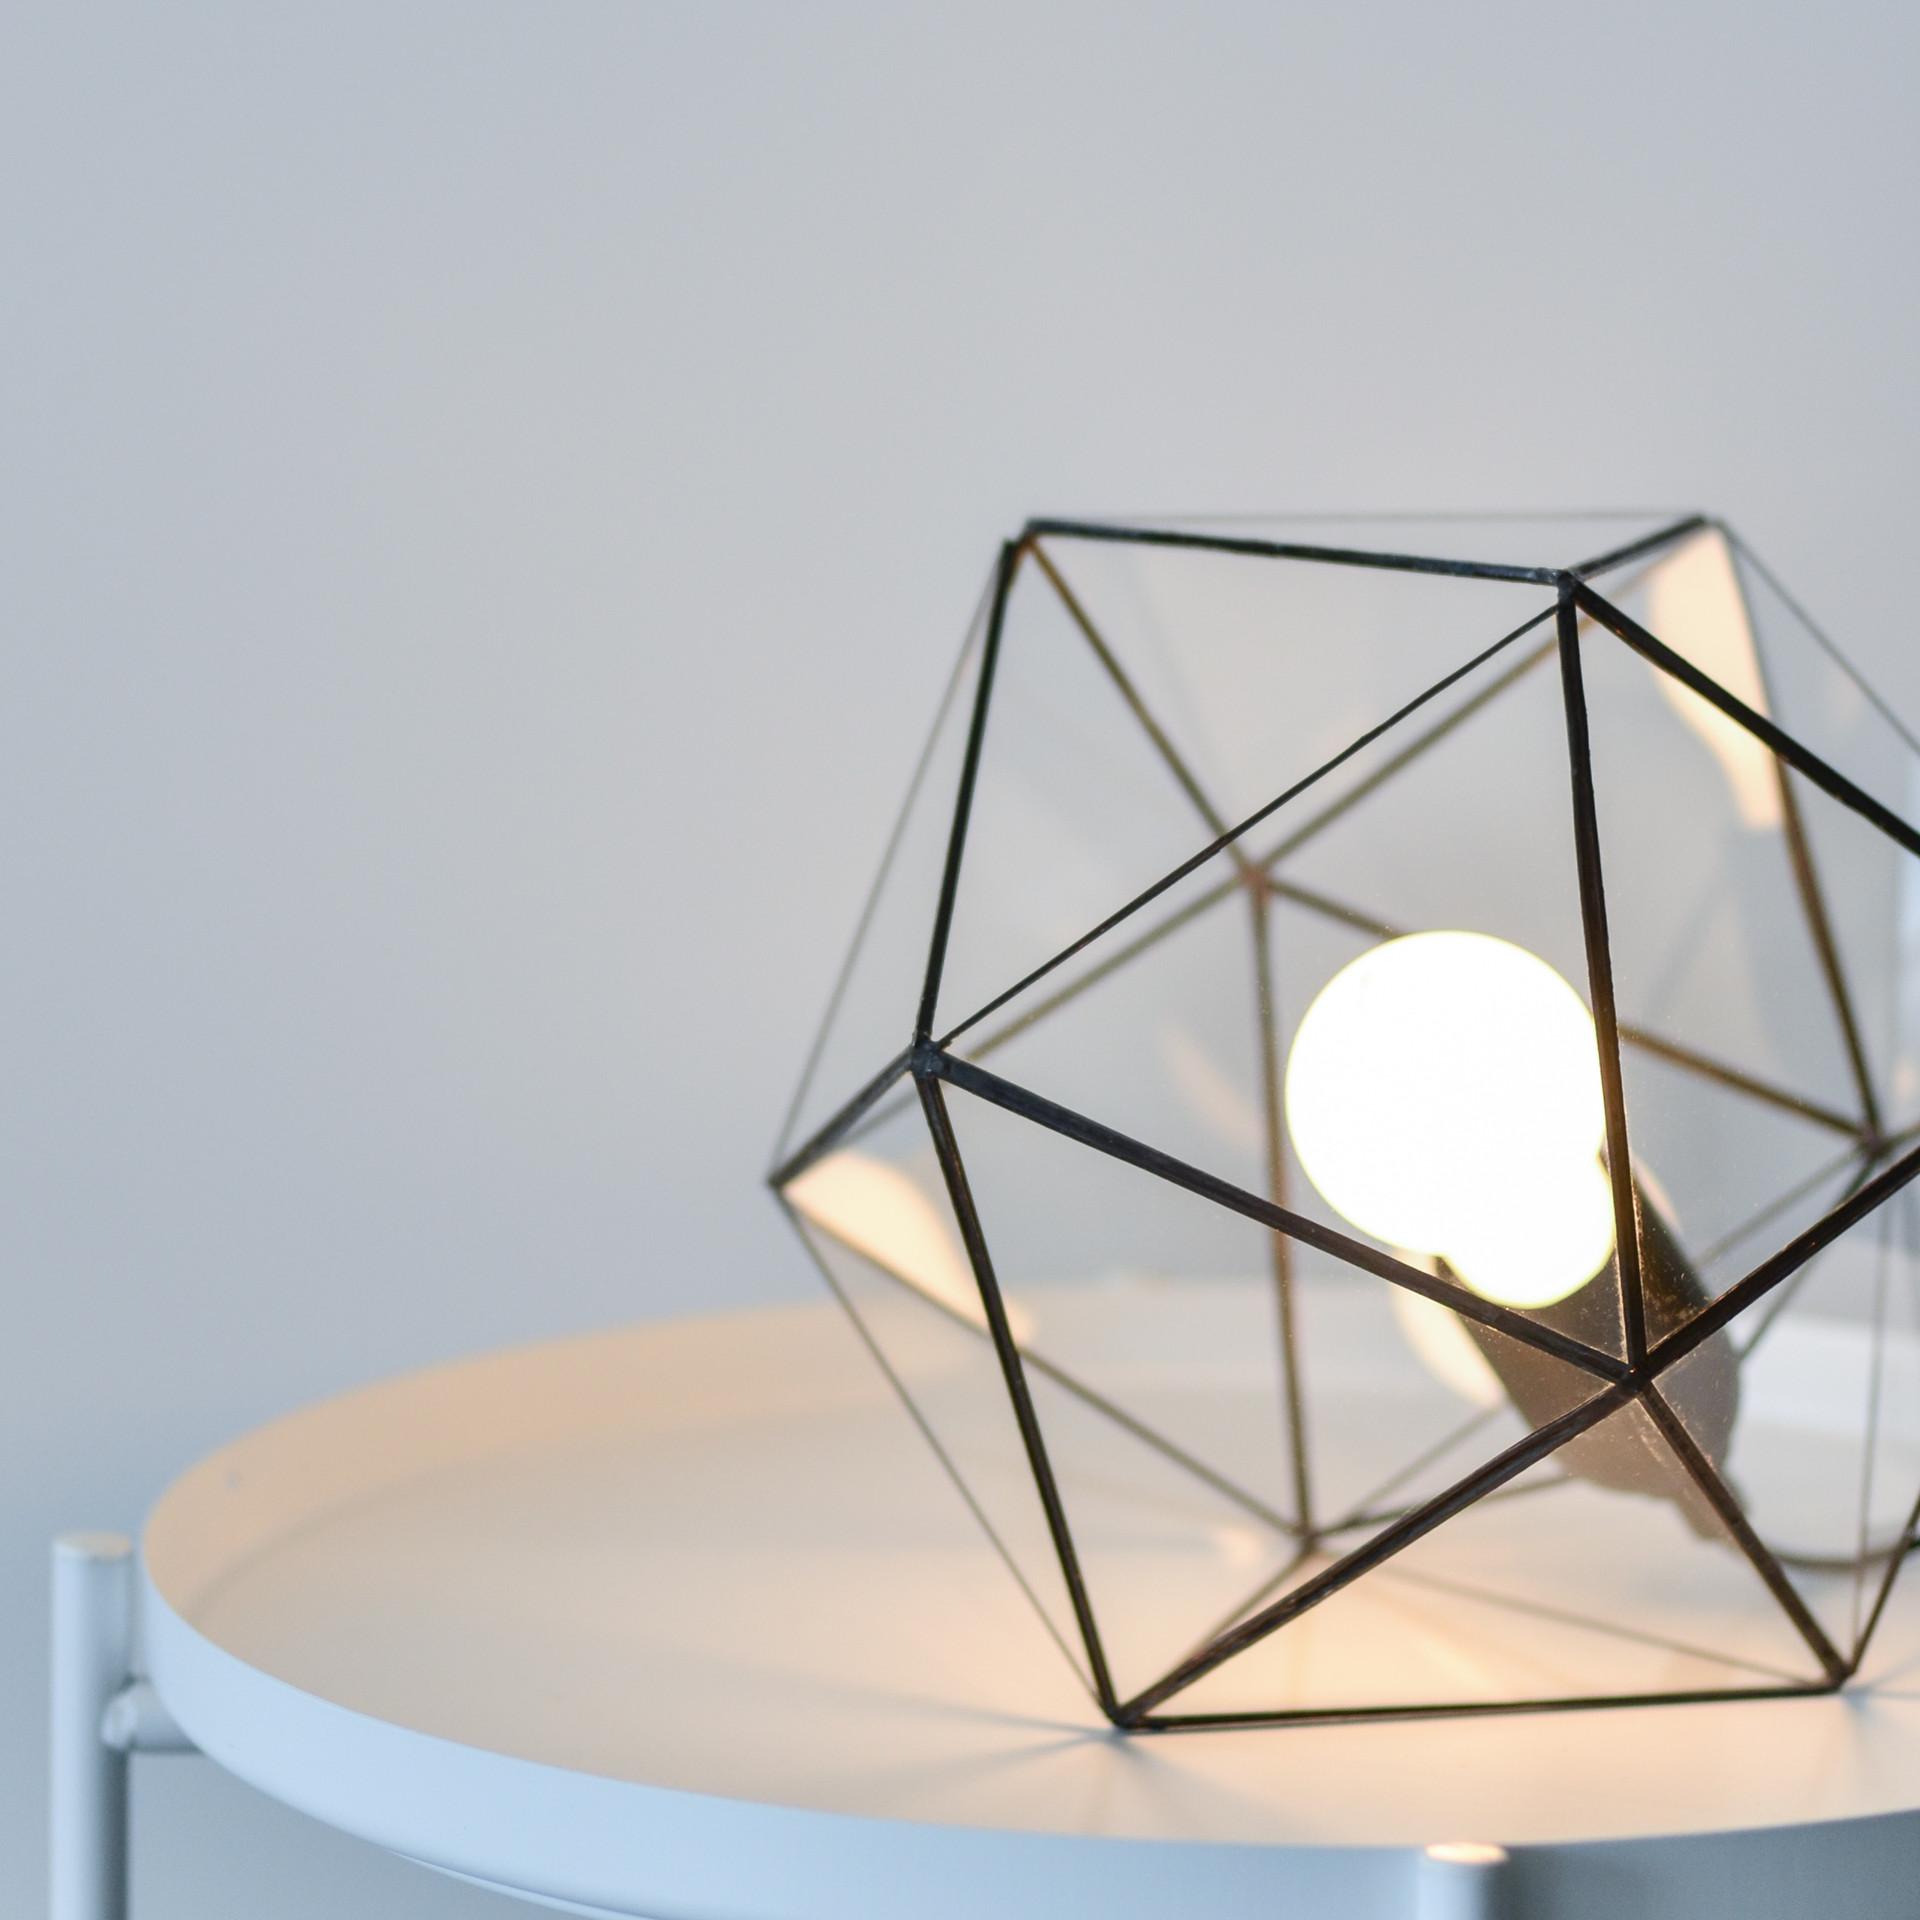 Glass table light